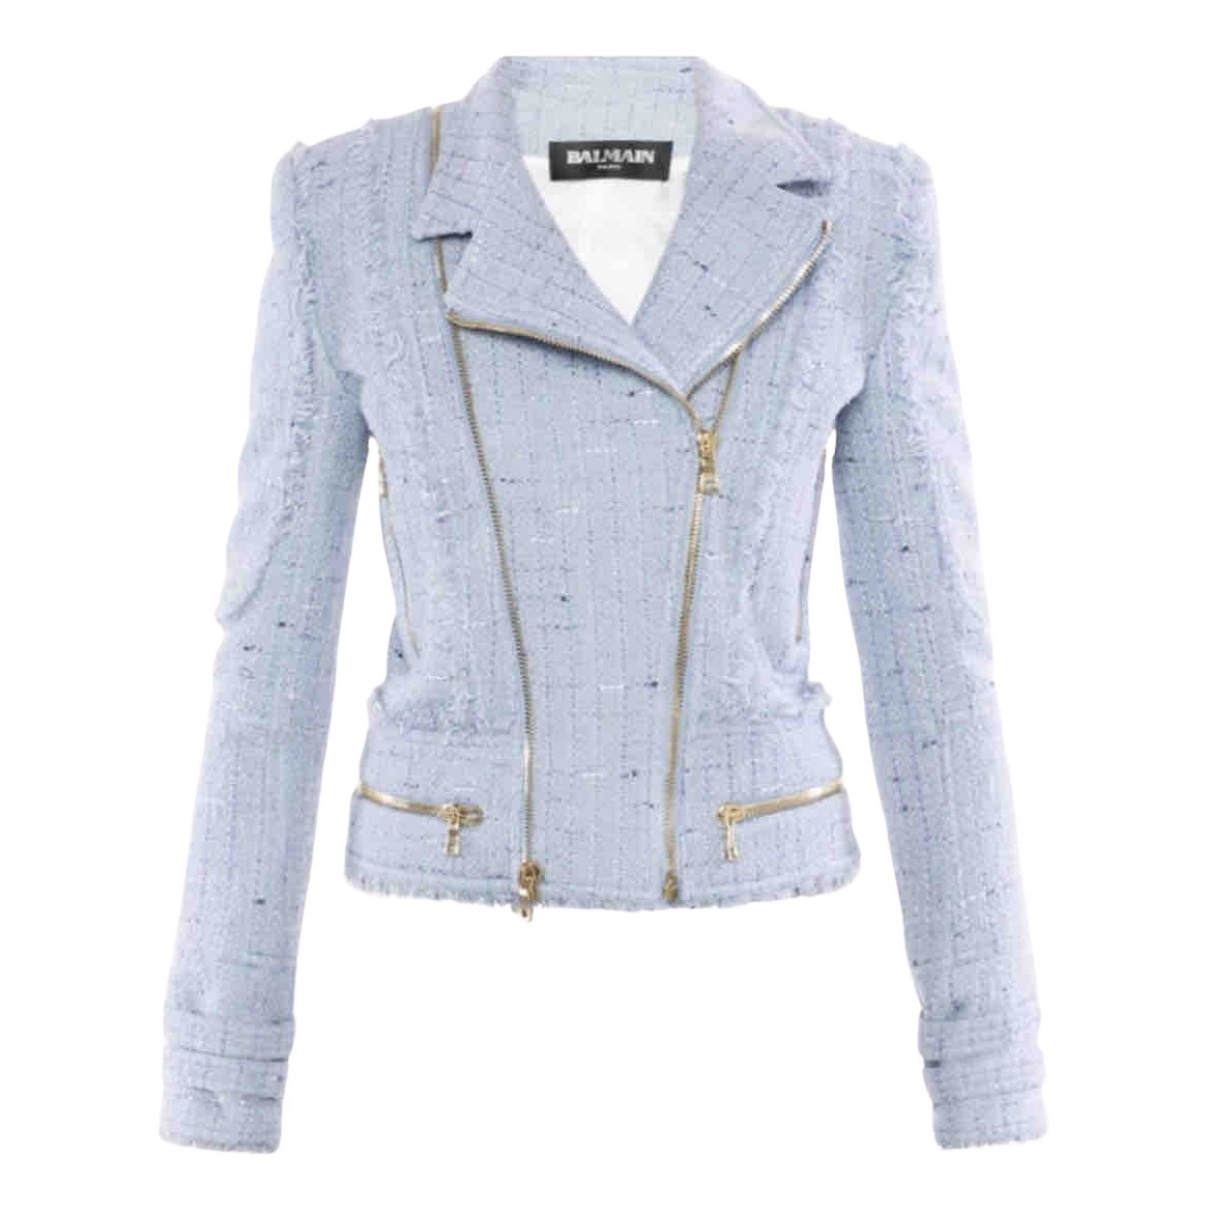 Balmain N Blue Tweed jacket for Women 36 FR